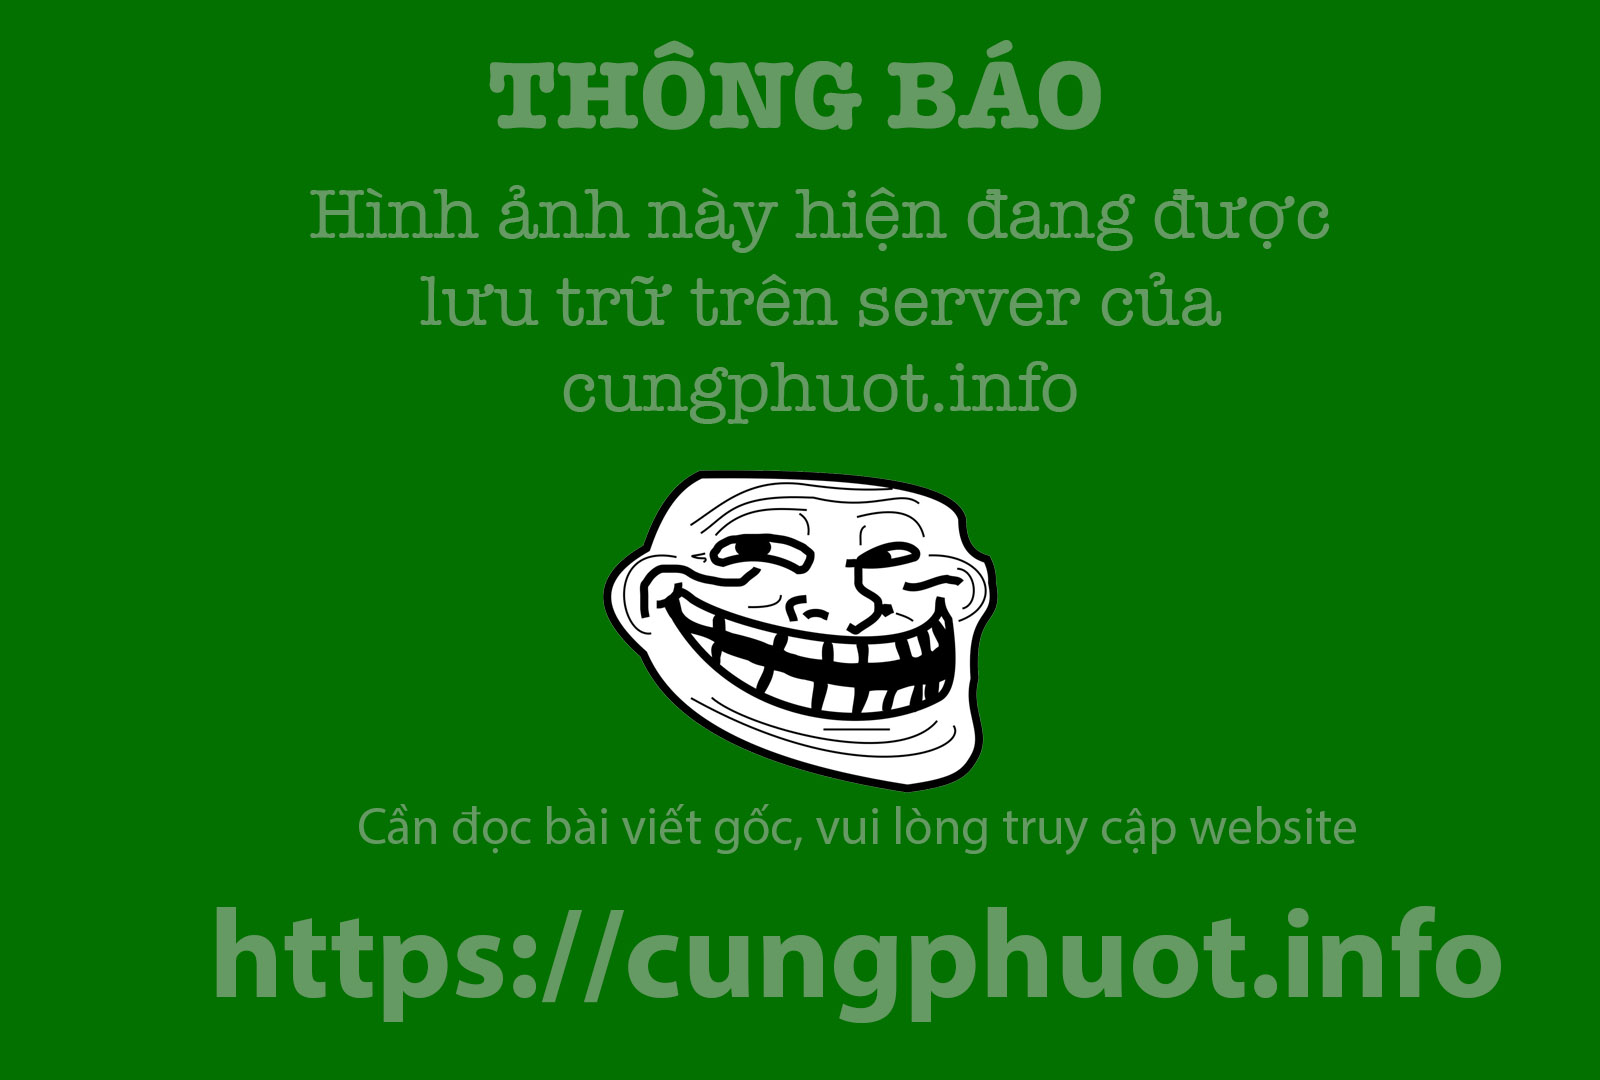 Ve dep thanh cao, huyen bi cua Dan vien Chau Son hinh anh 5